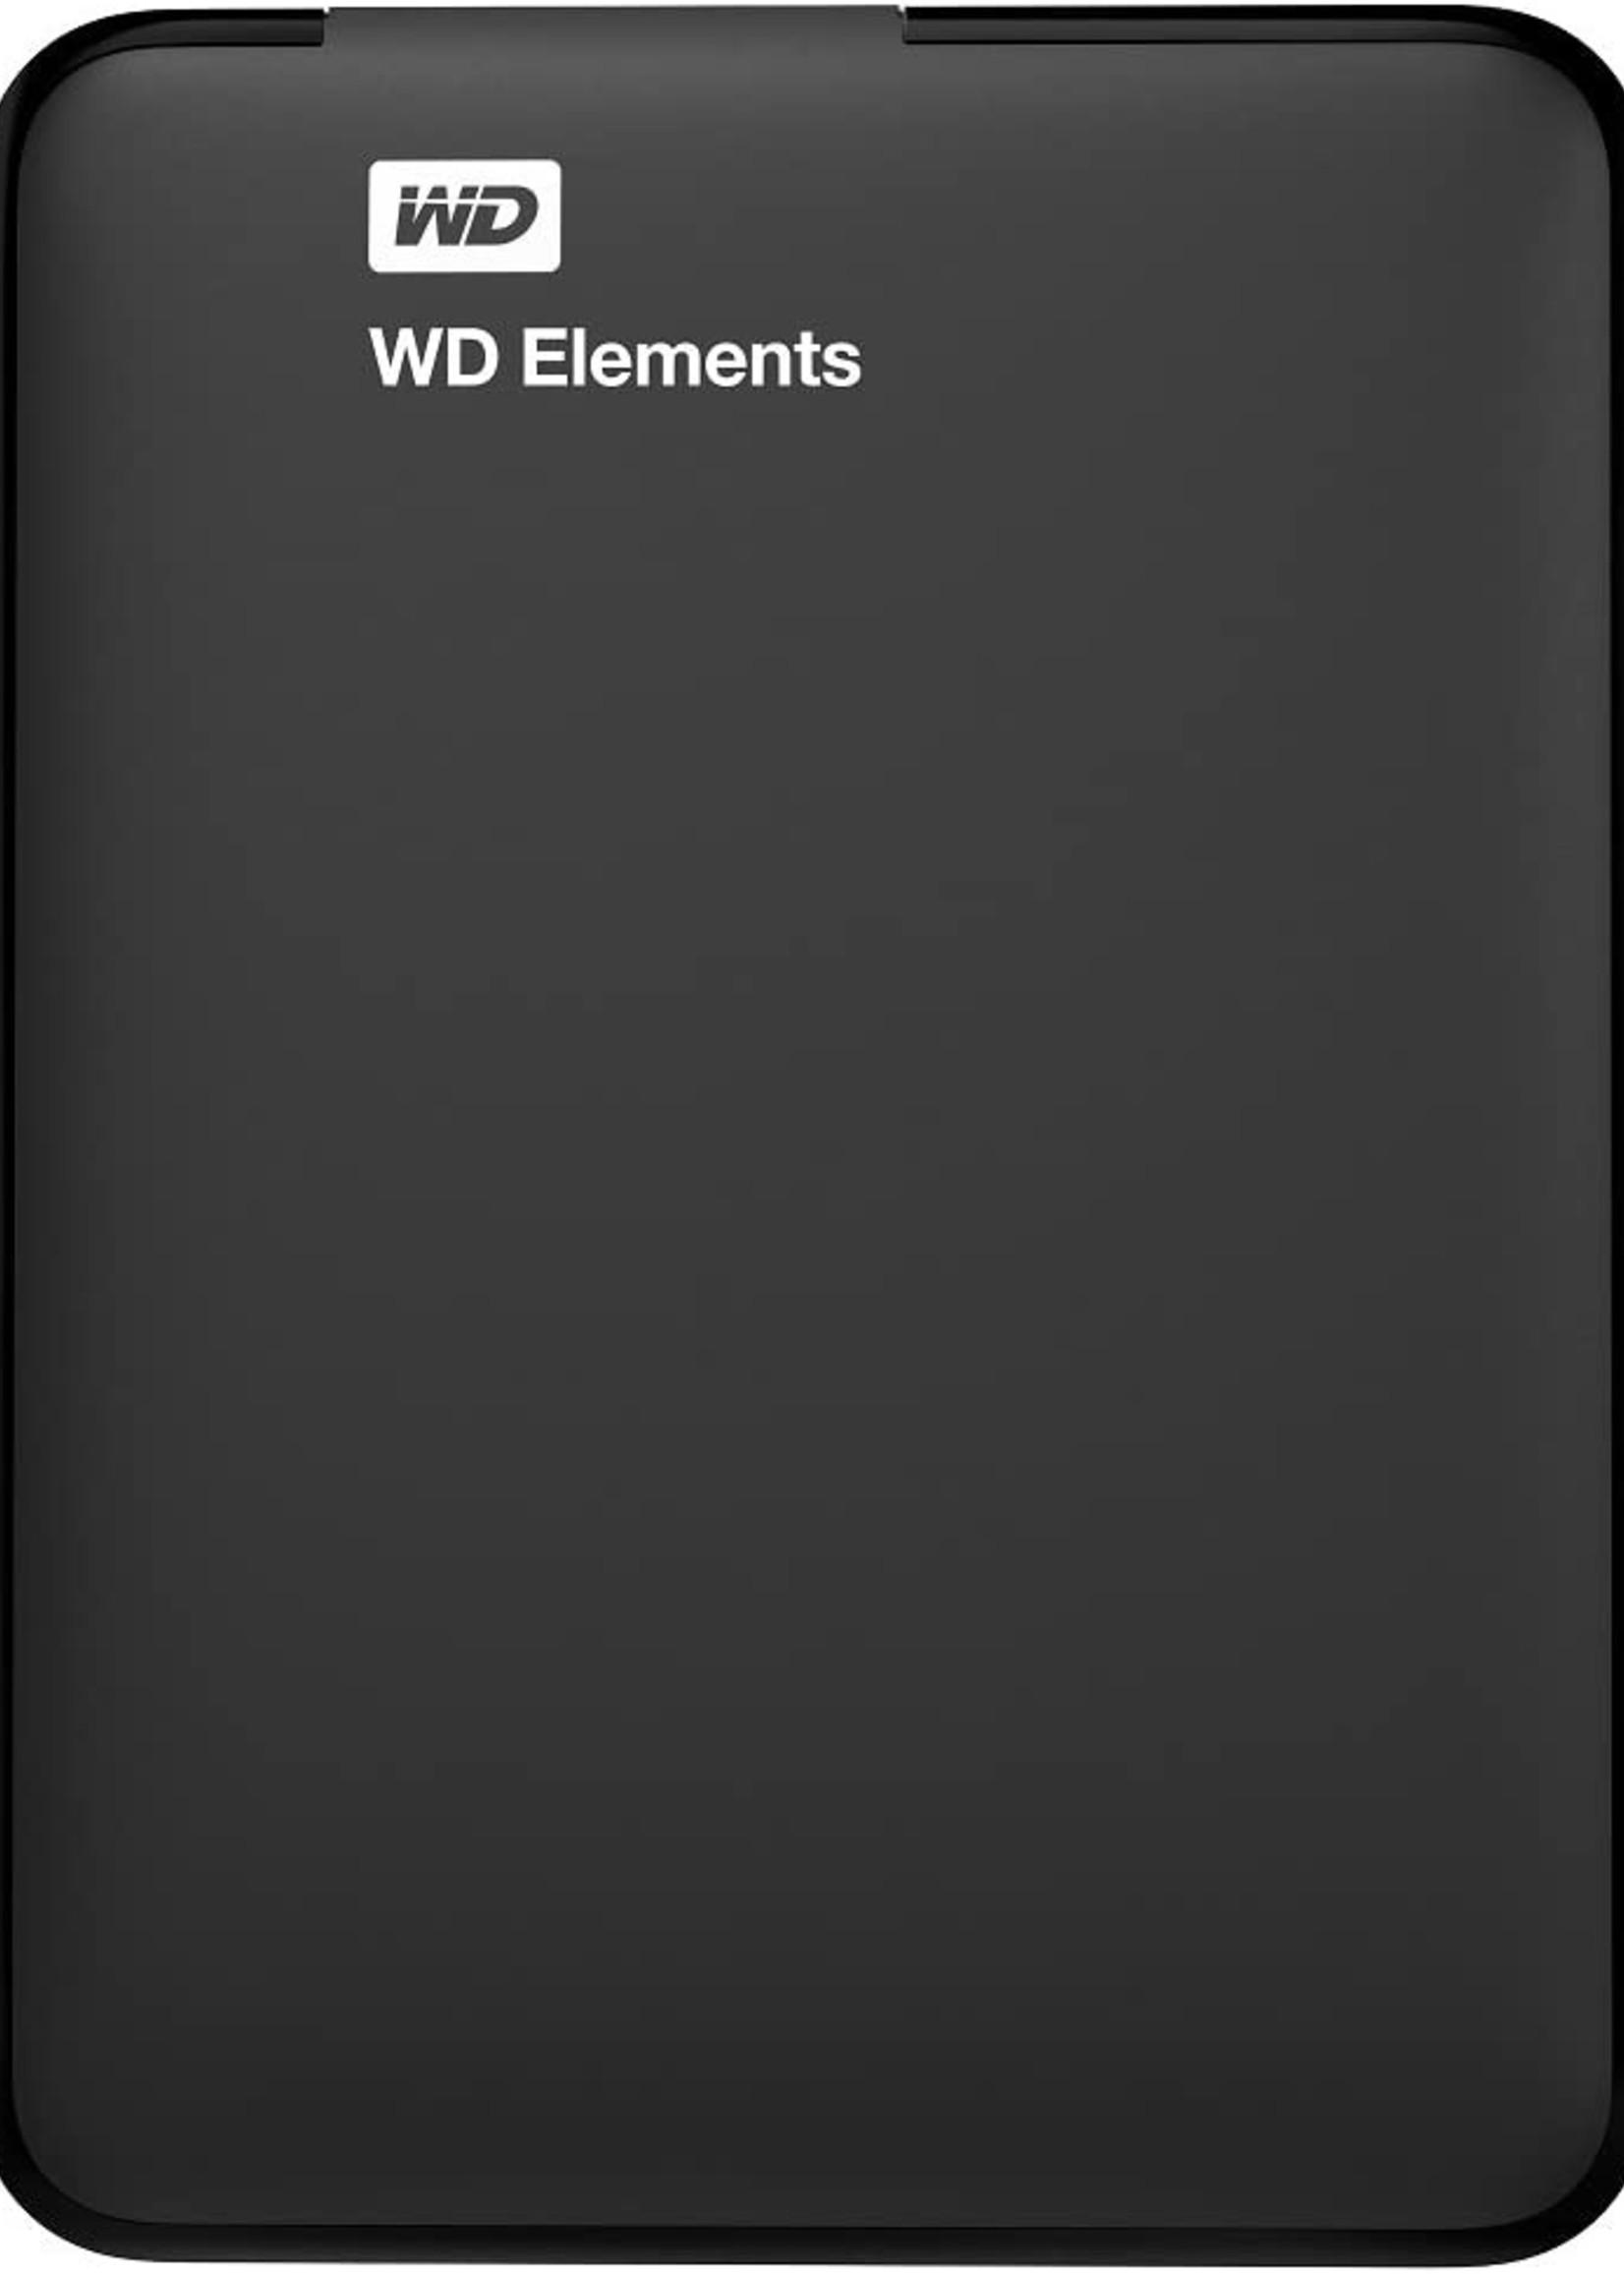 Western Digital 1TB WD Elements External USB 3.0 HHD